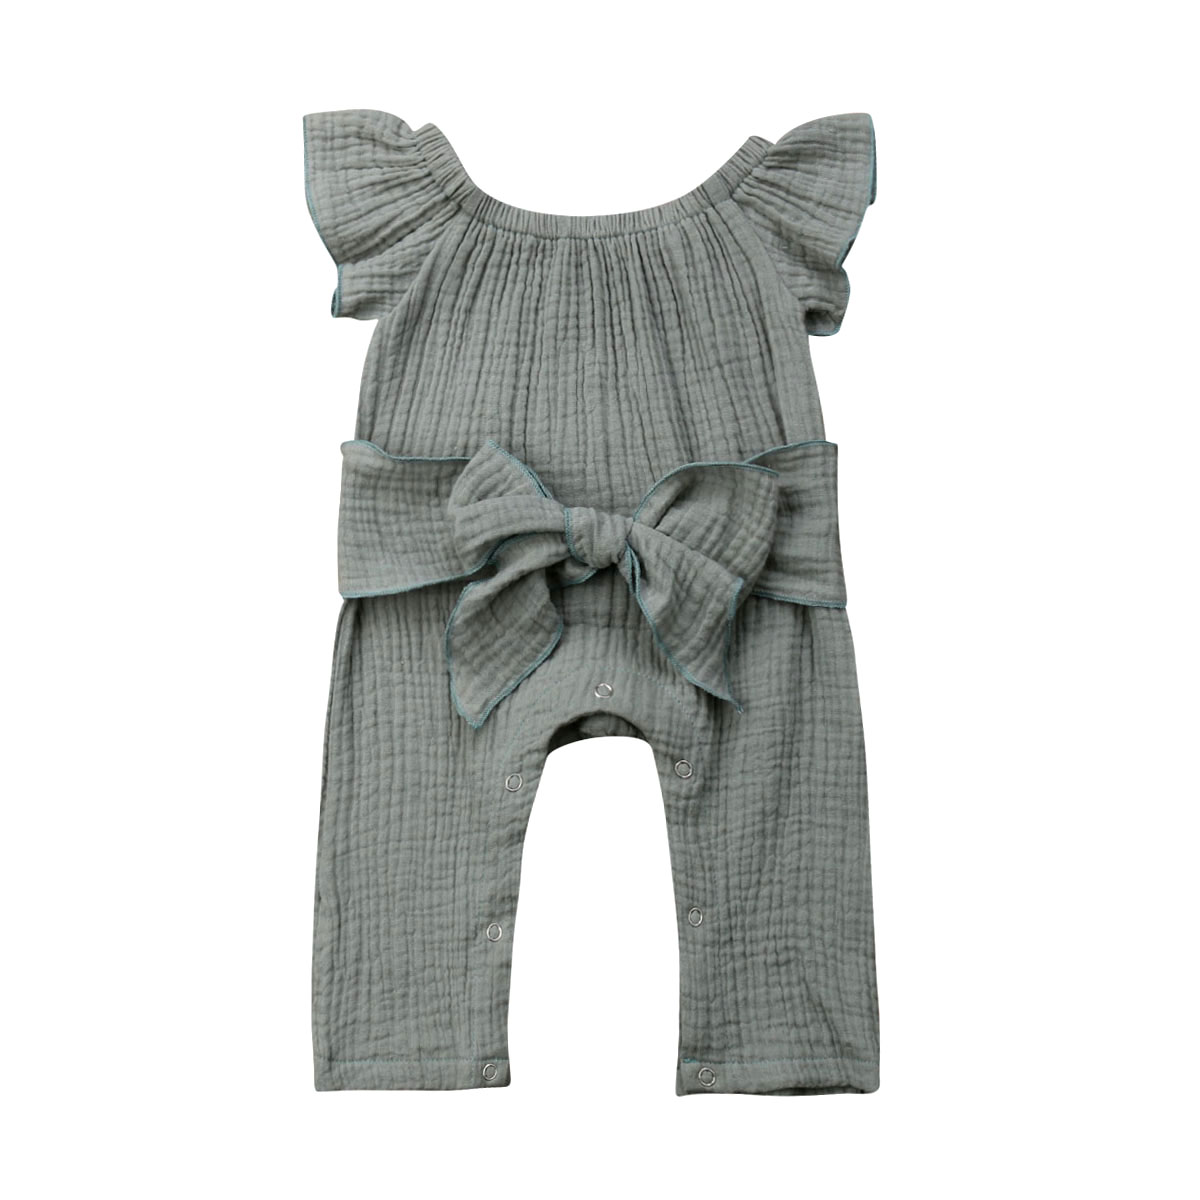 0-24 M Pasgeboren Baby Meisje Off Shoulder Solid Grey Boog Katoenen Romper Jumpsuit Outfits Zomer Kleding Betrouwbare Prestaties